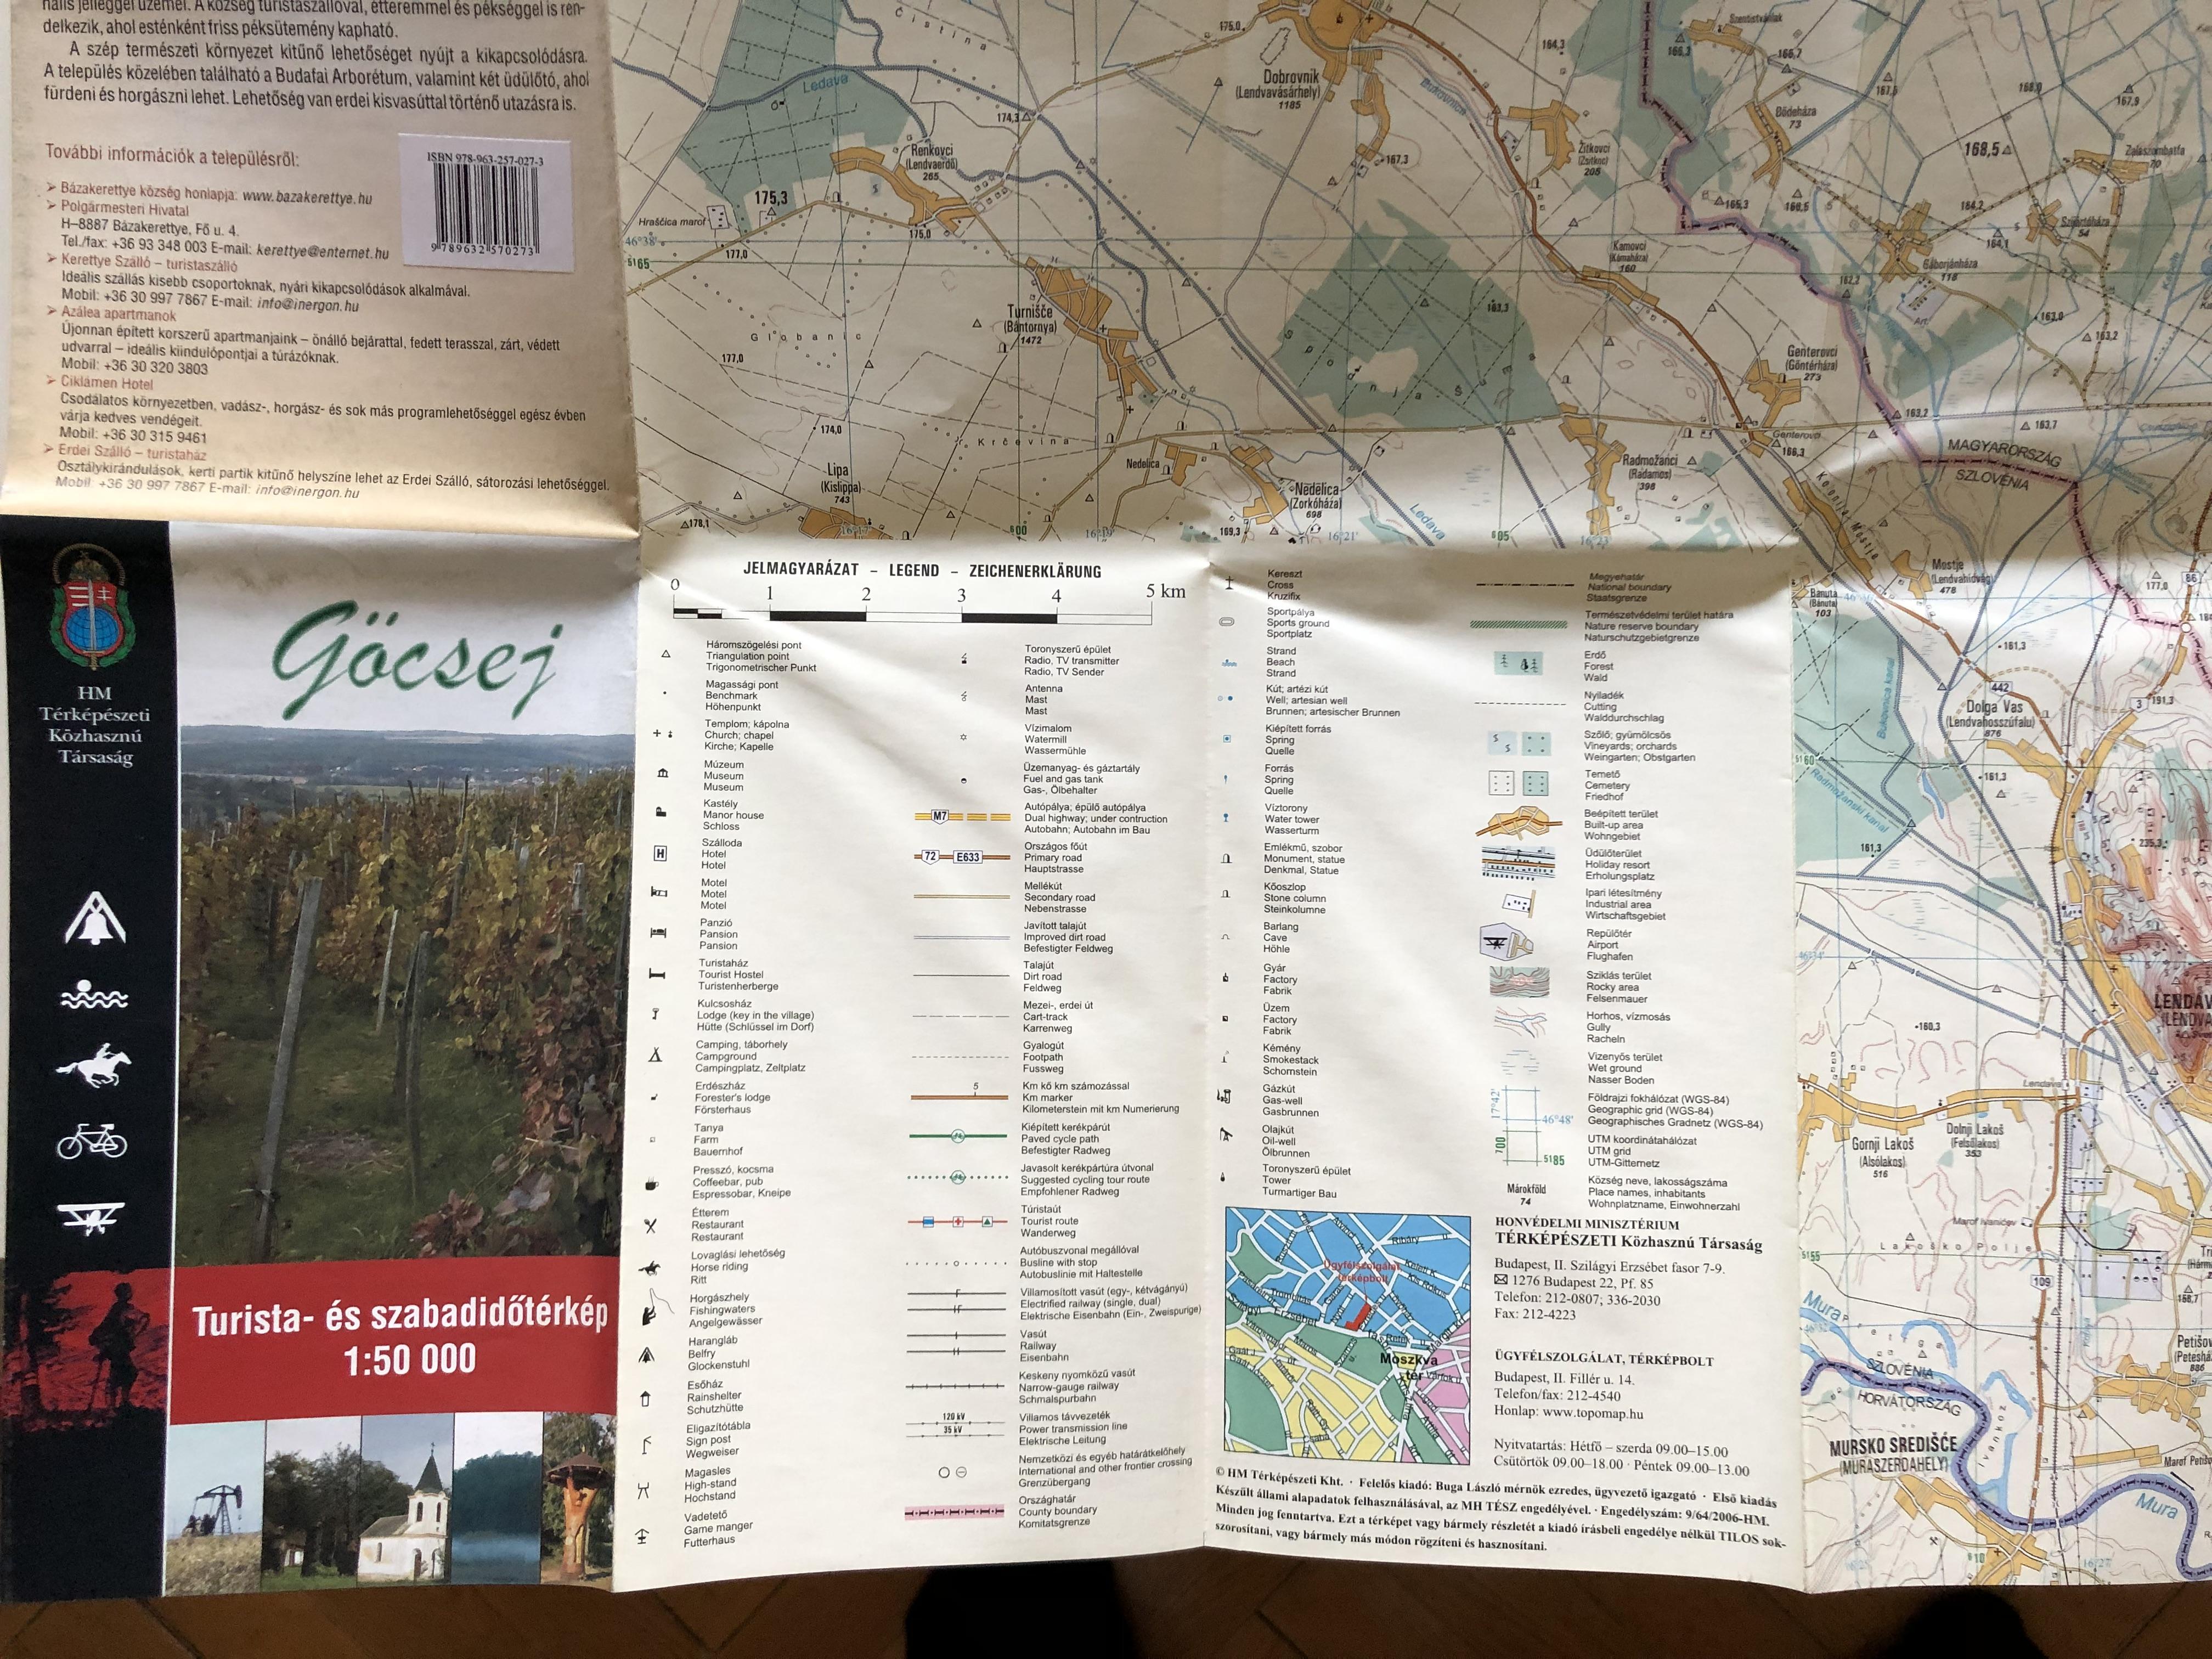 g-csej-szabadid-s-turistat-rk-p-1-50.000-tourist-and-free-time-map-of-the-g-csej-region-hungarian-english-and-german-legend-4-.jpg